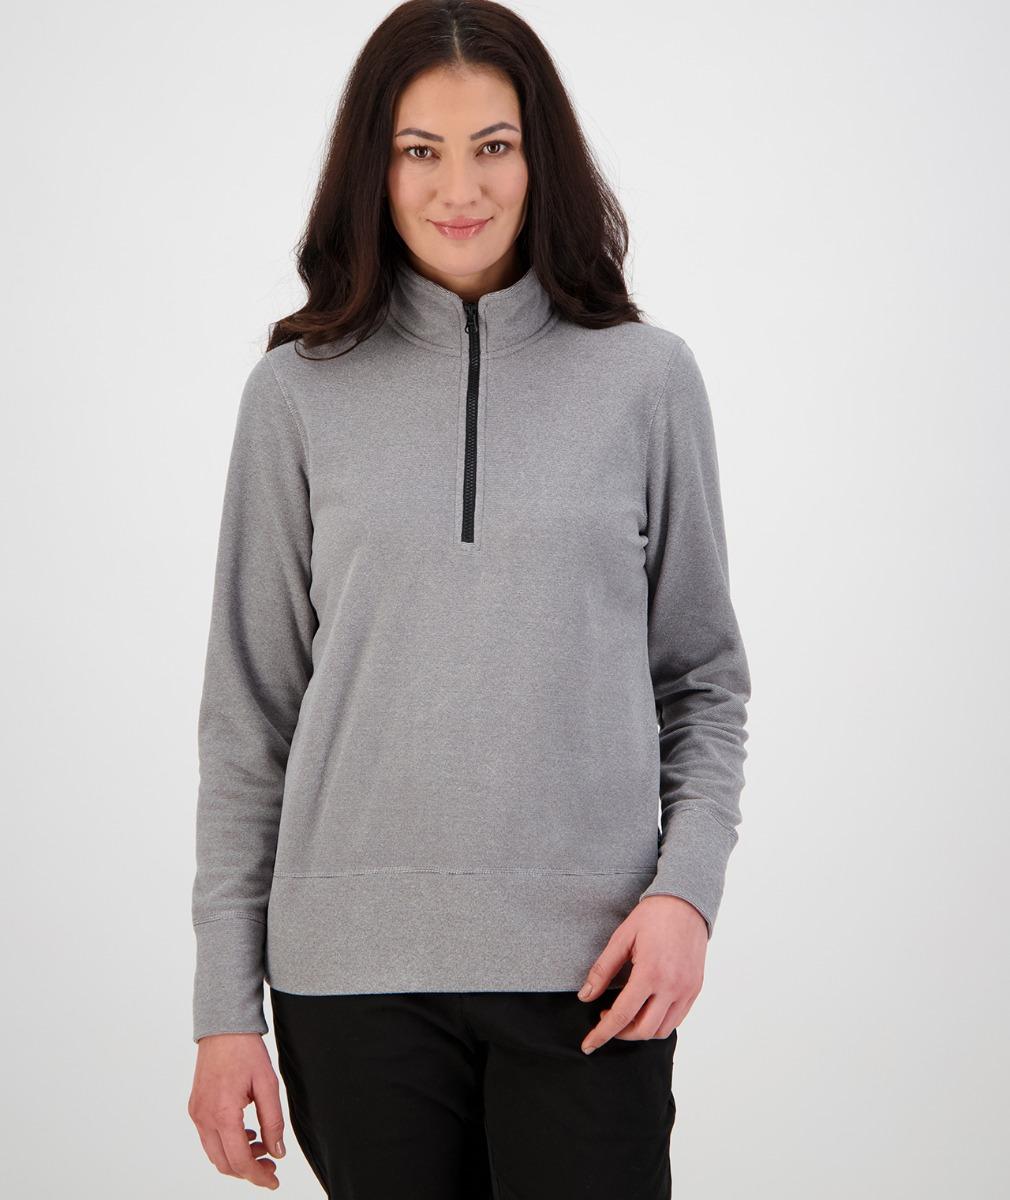 Swanndri Women's Stanton Fleece in Light Grey